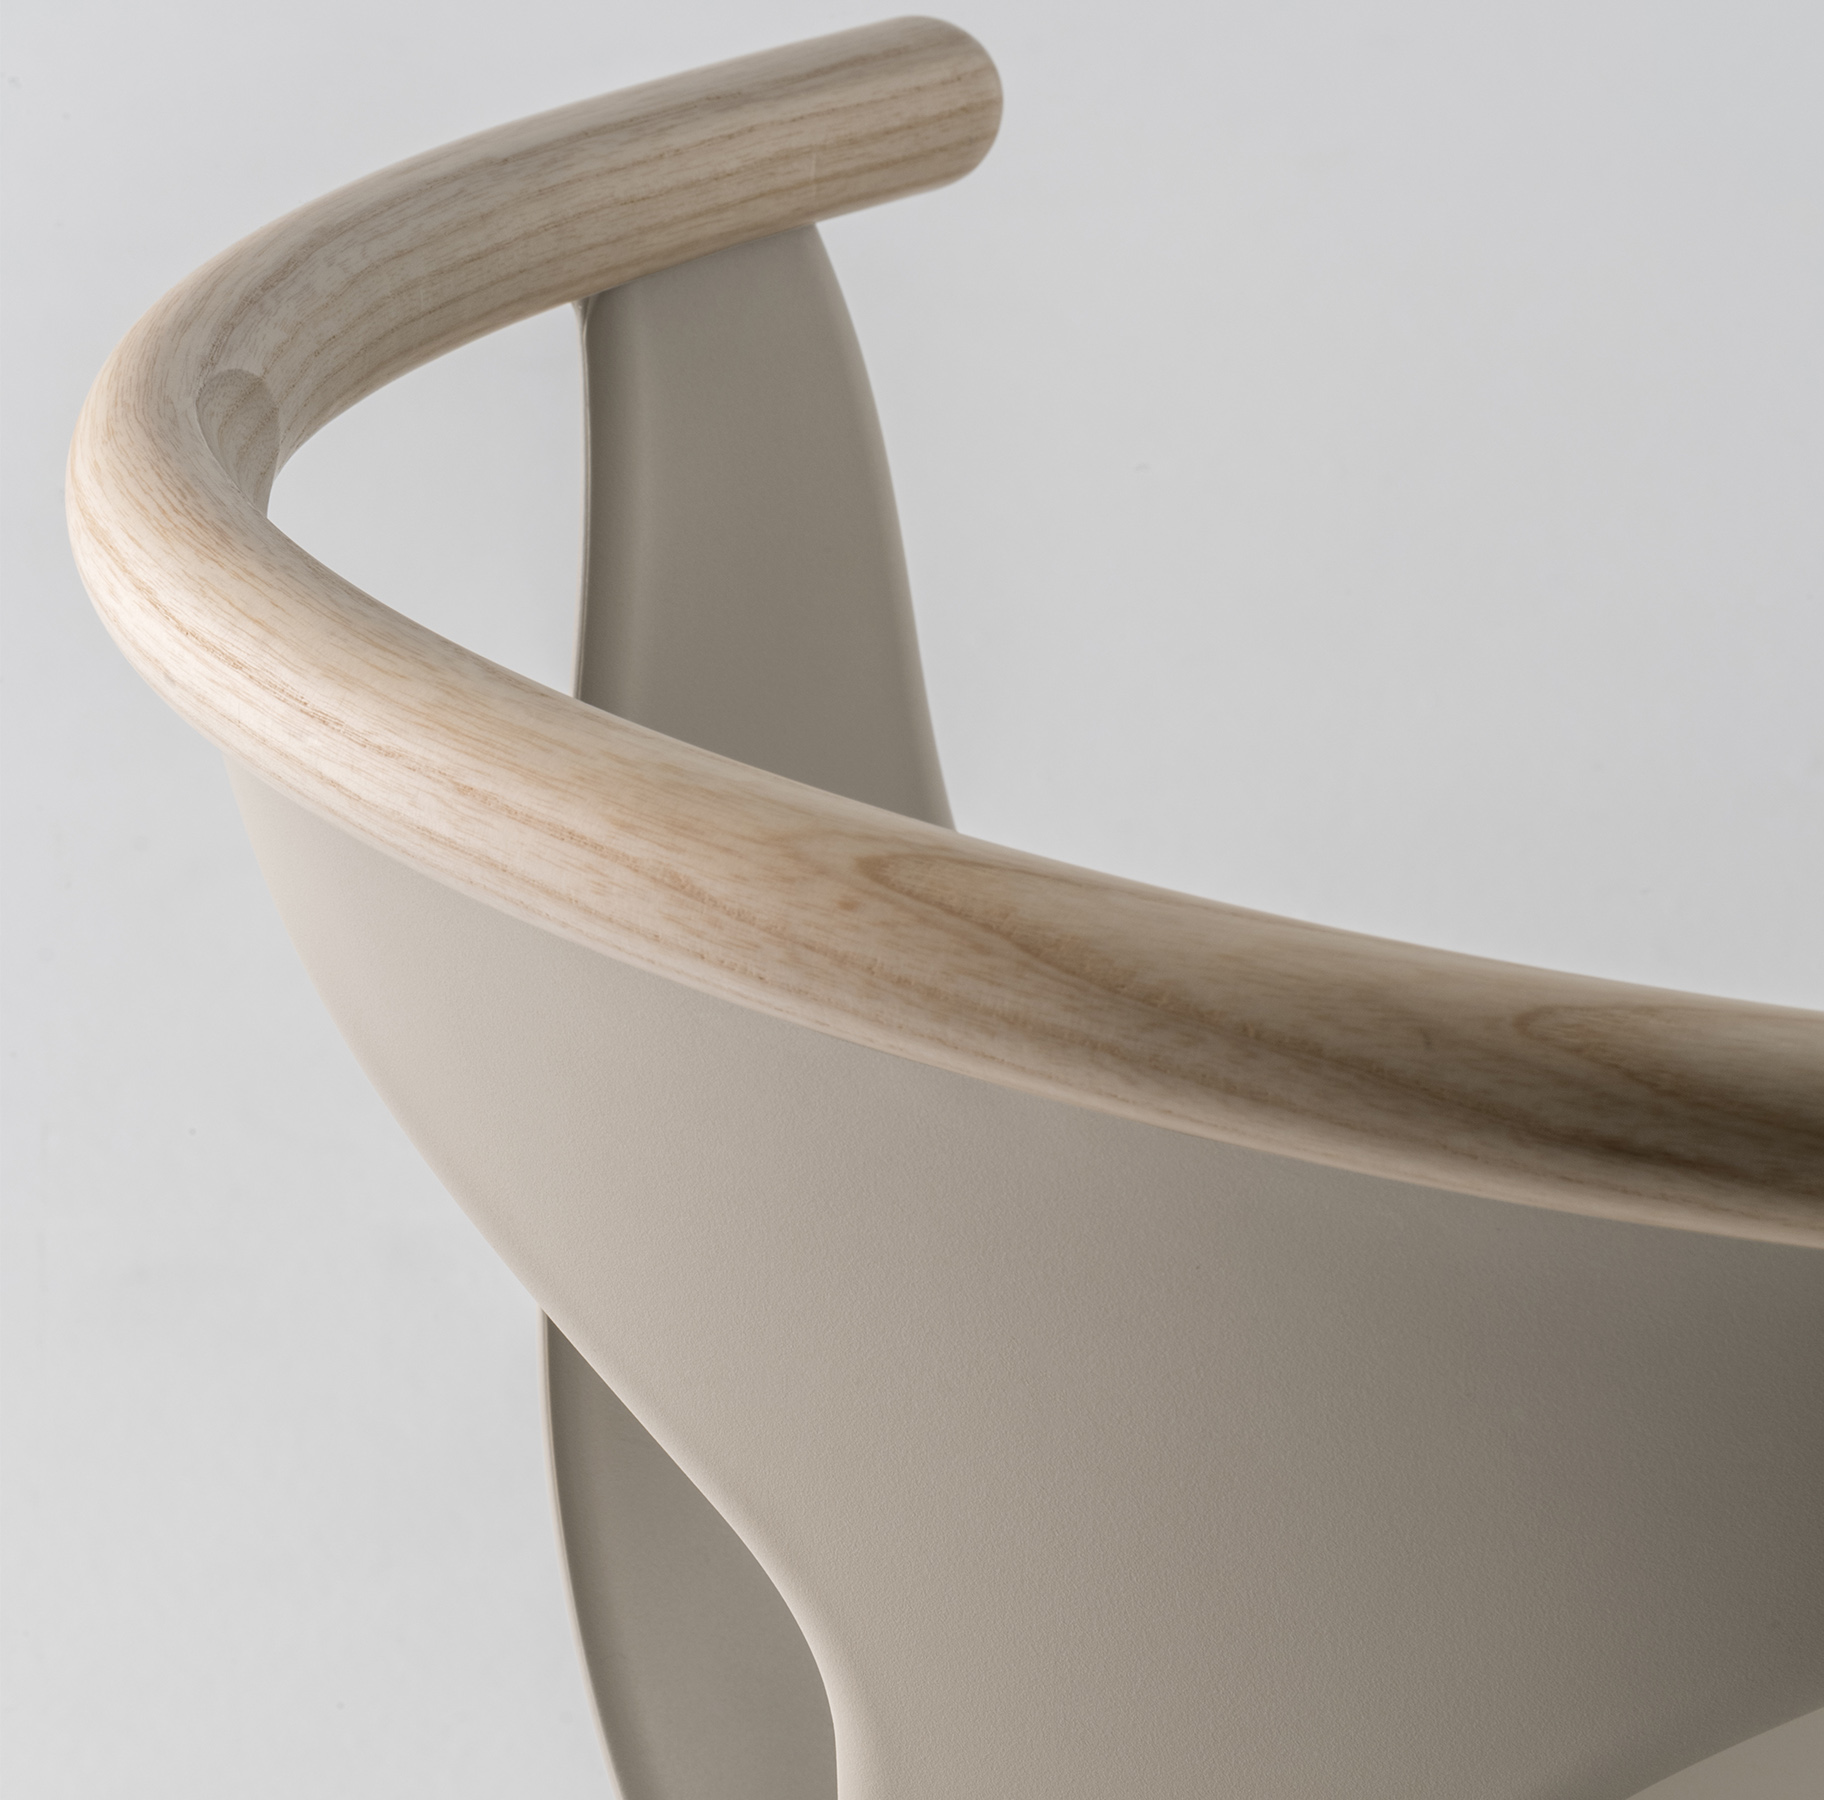 Sedie moderne: un modo elegante per arredare uno spazio